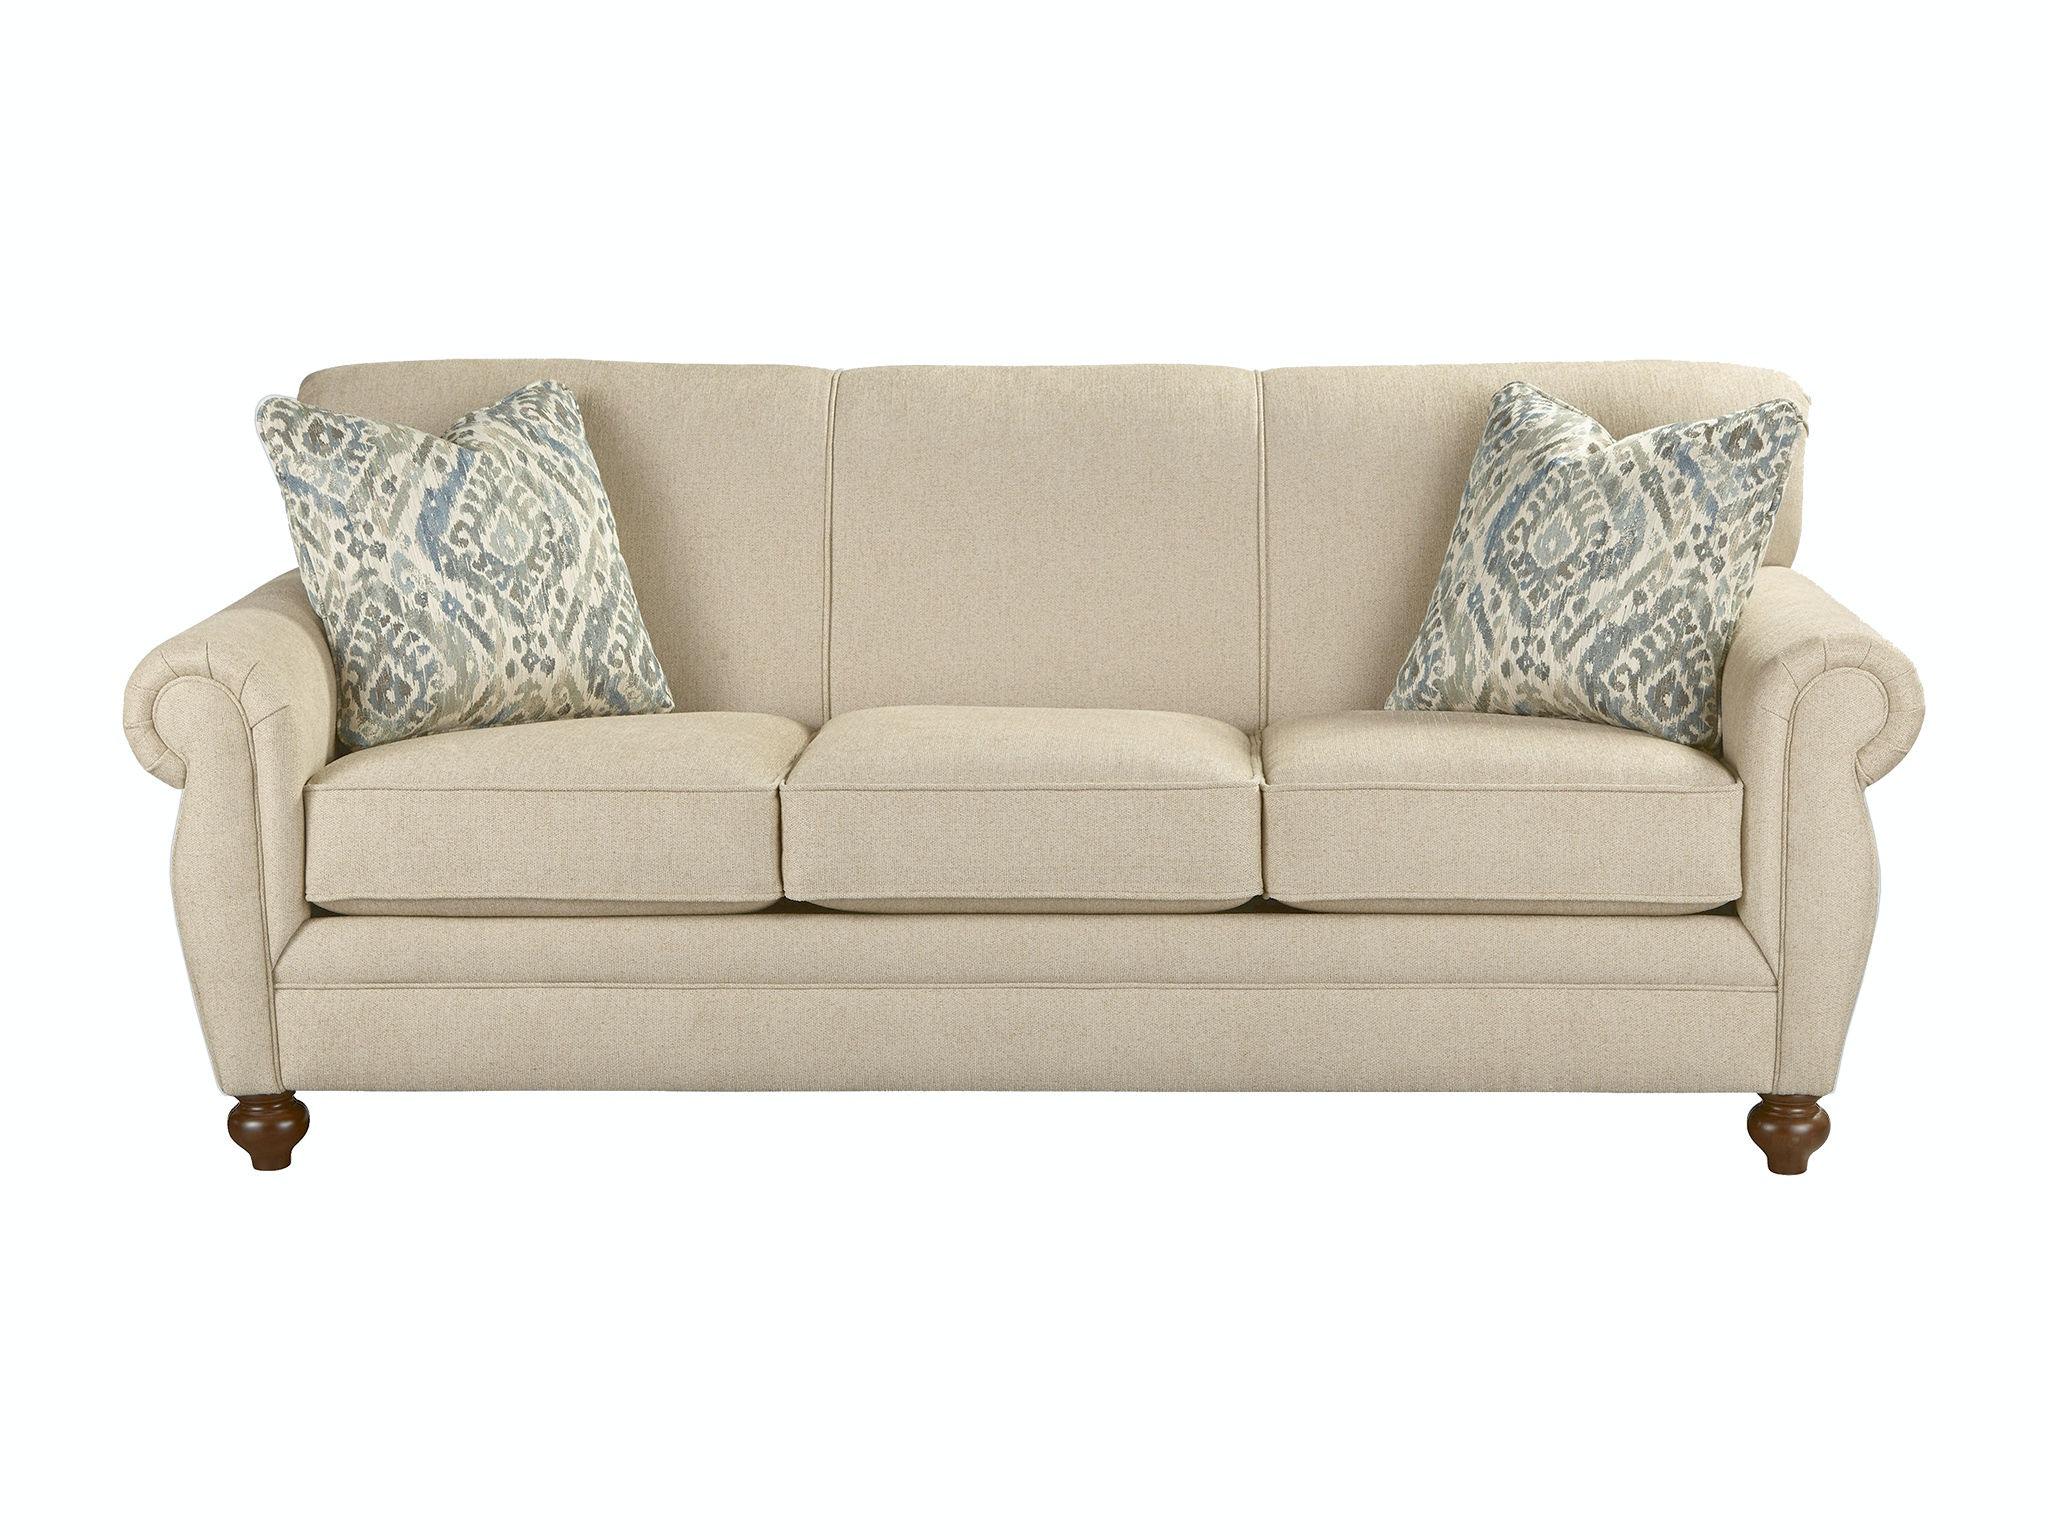 Union Furniture